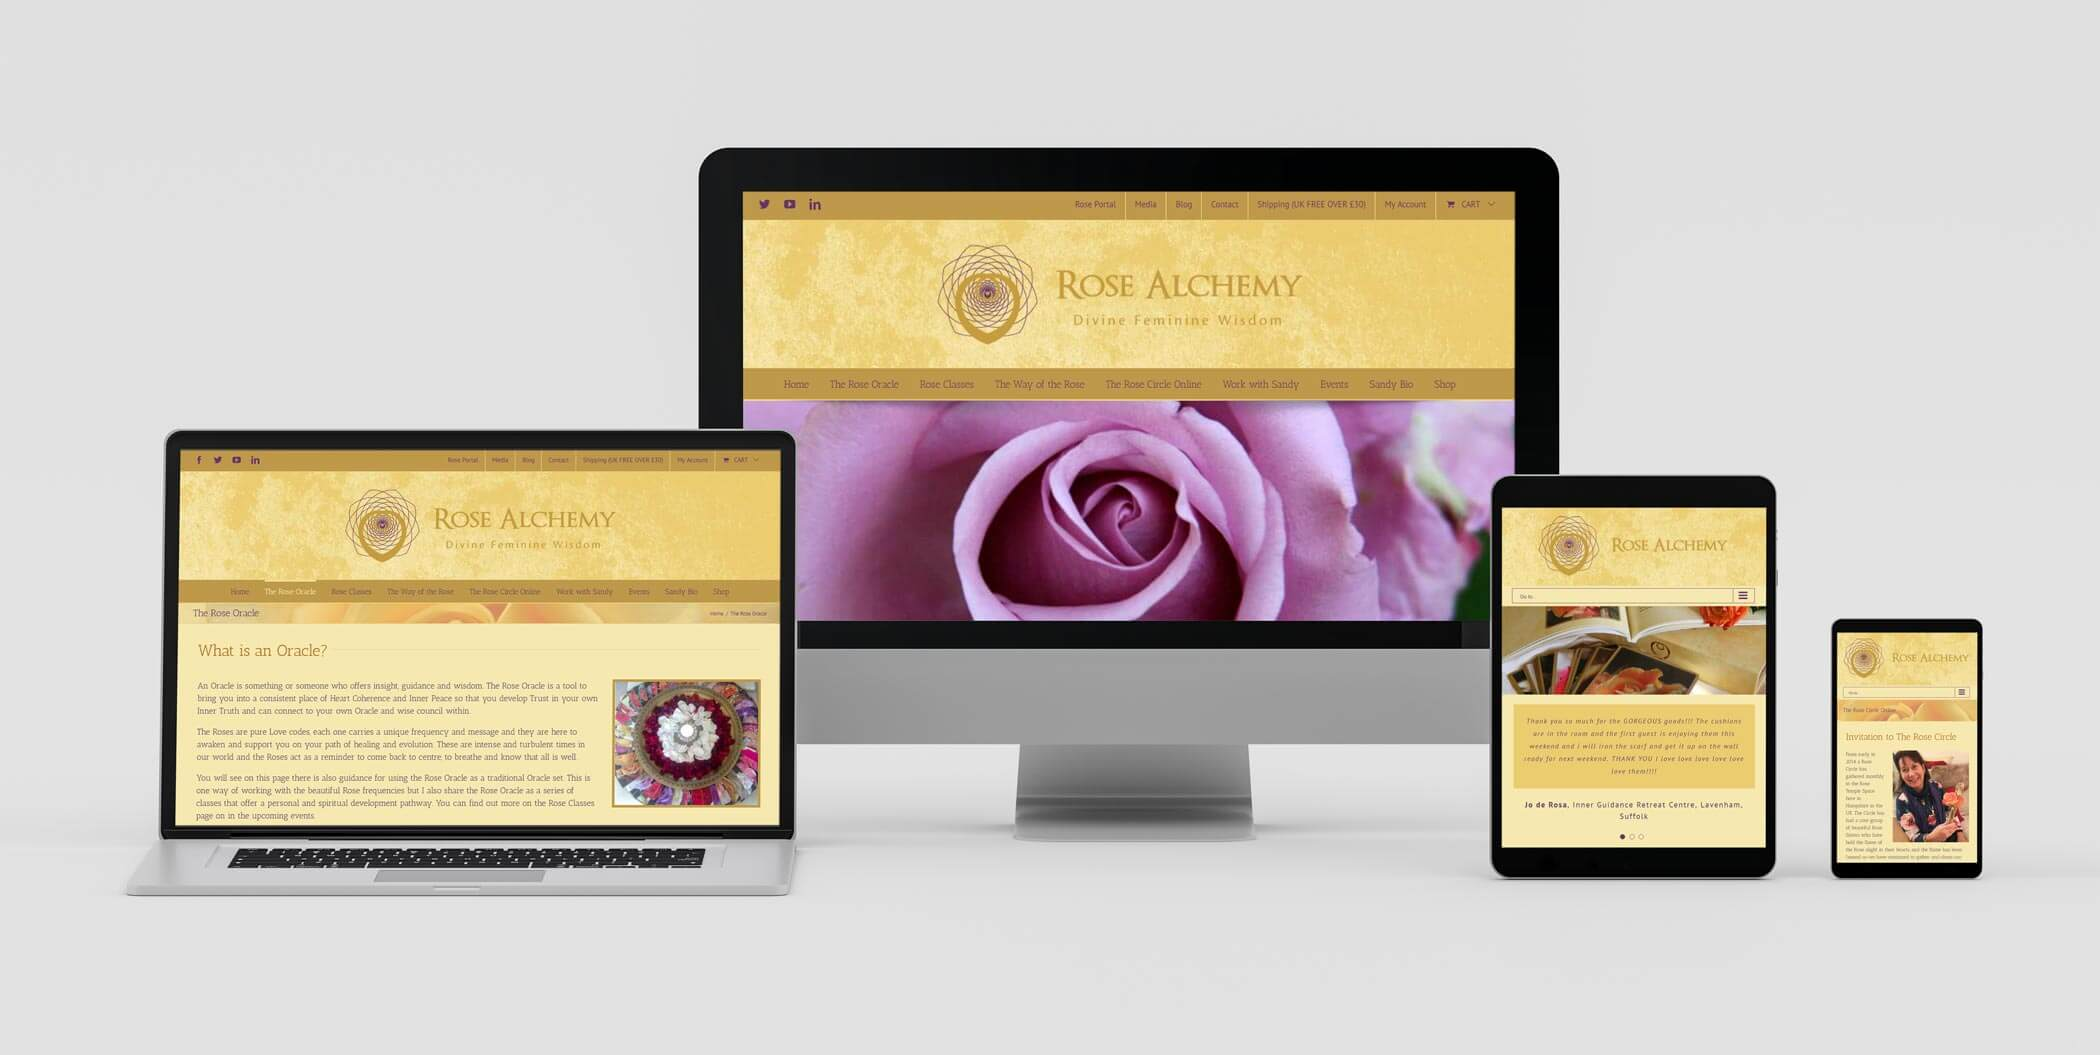 Responsive Web Design Layouts on Various Devices - Wordpress Web Design